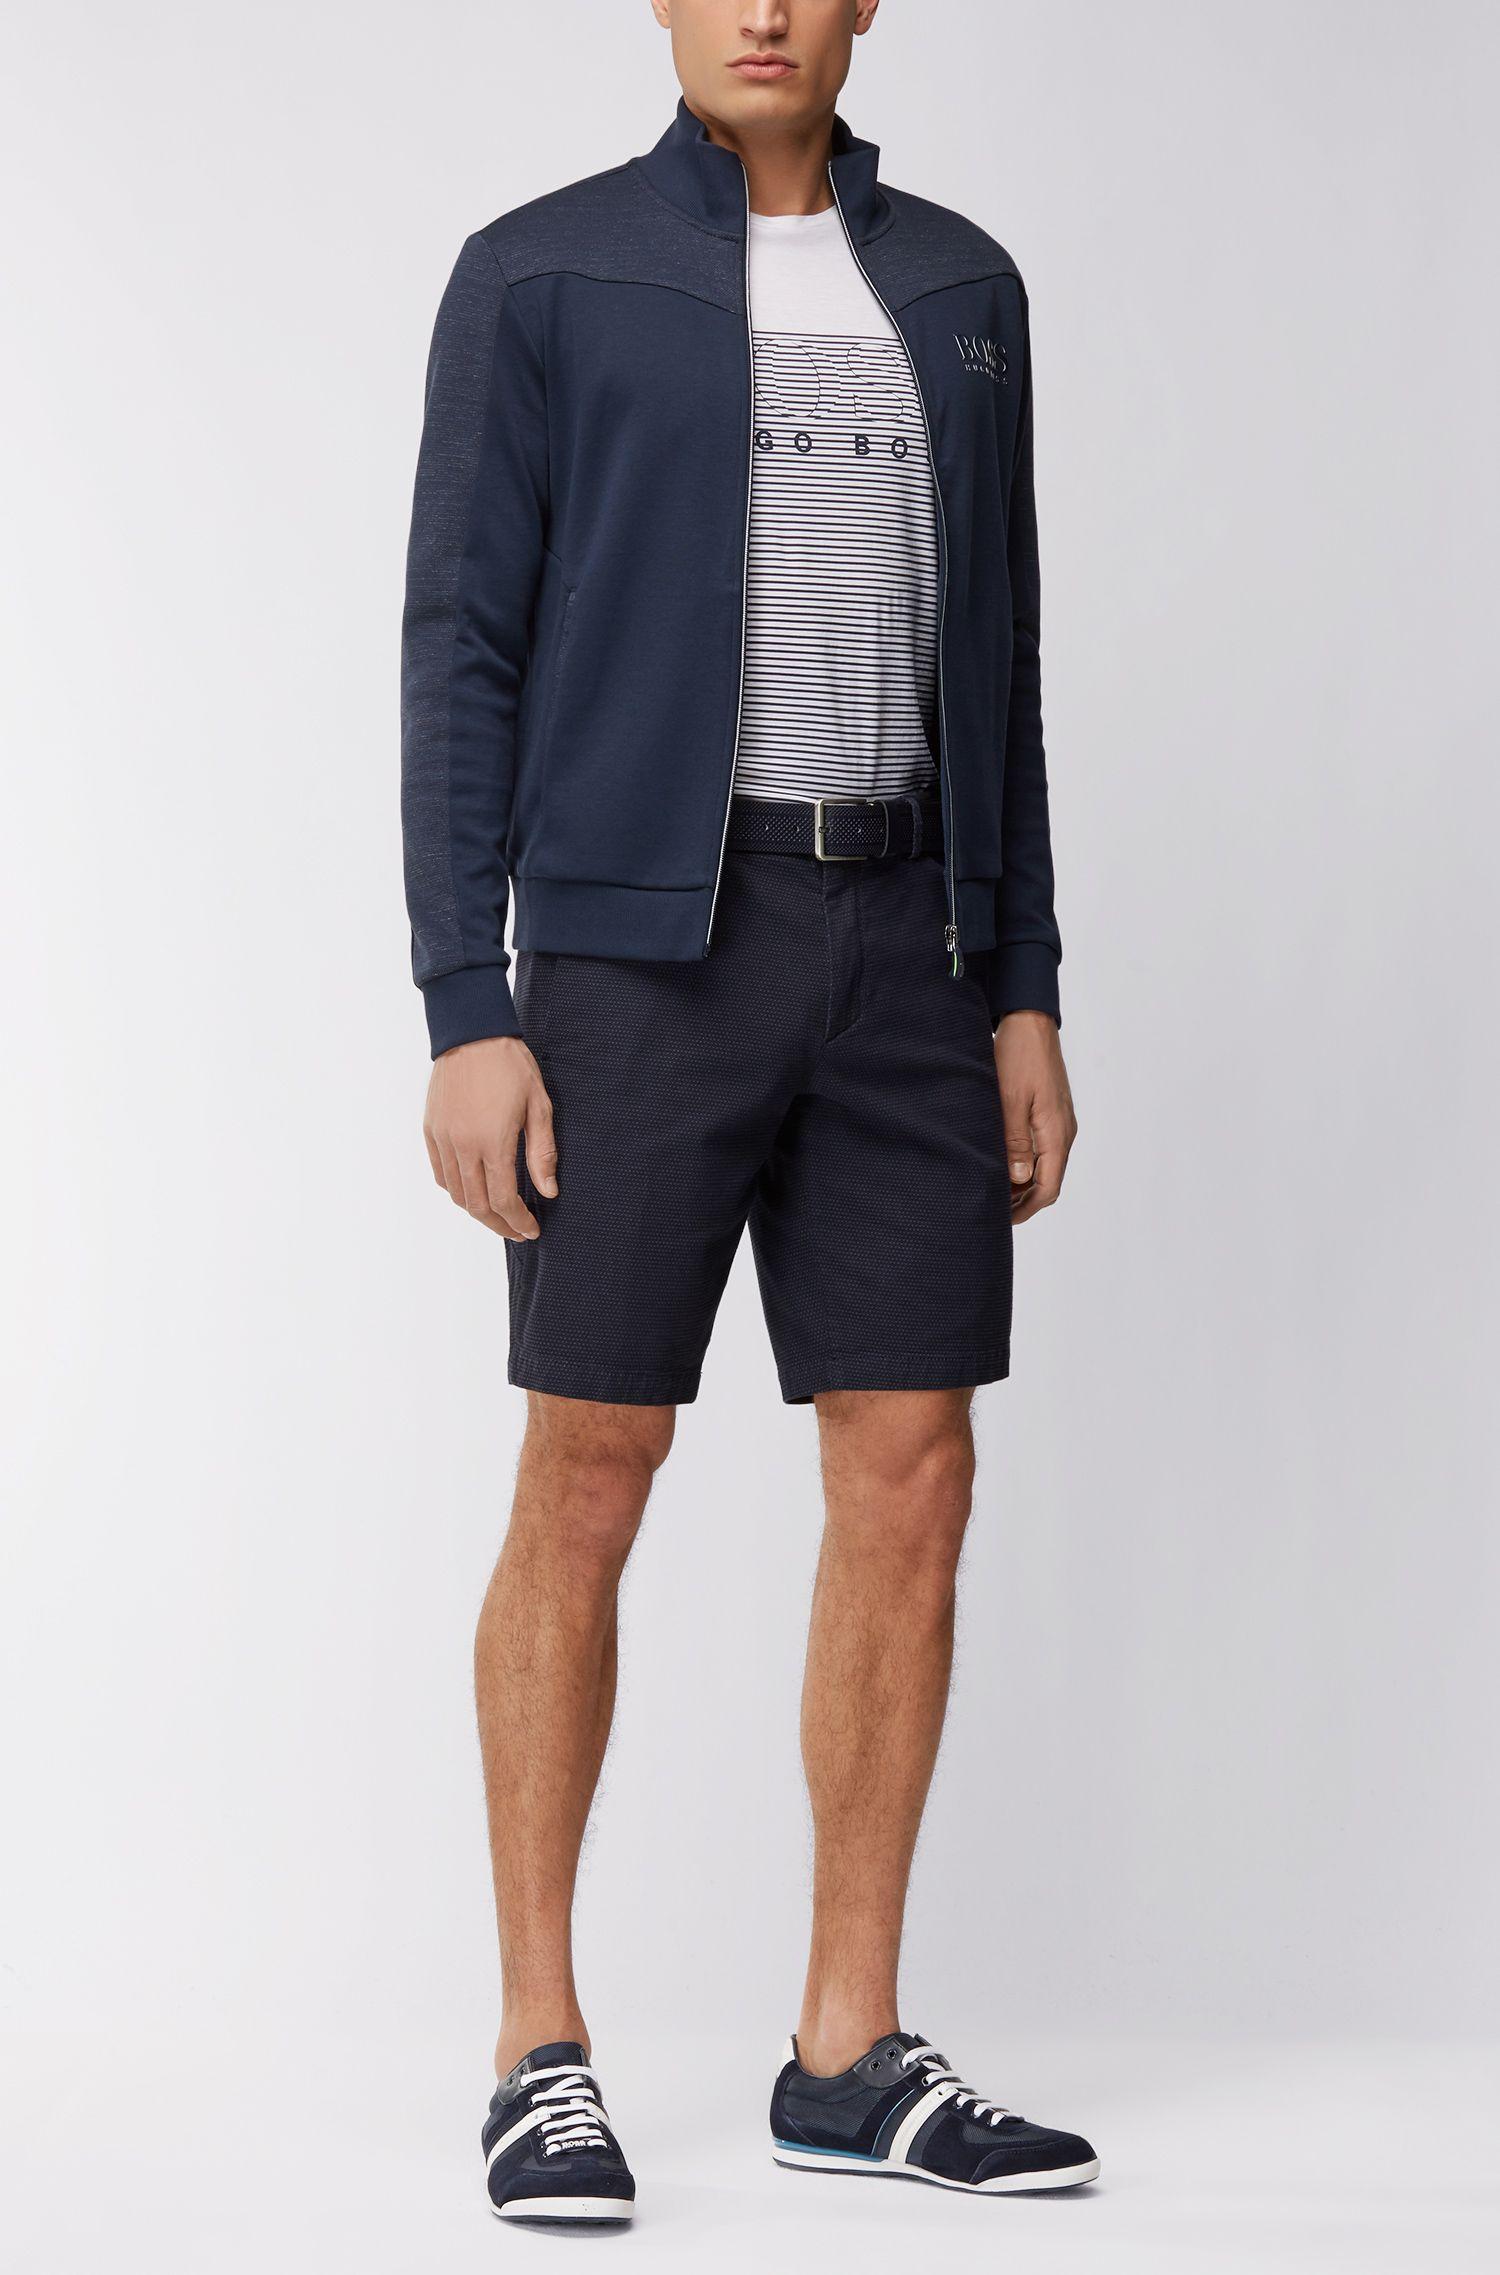 Regular-fit jacket in a cotton blend